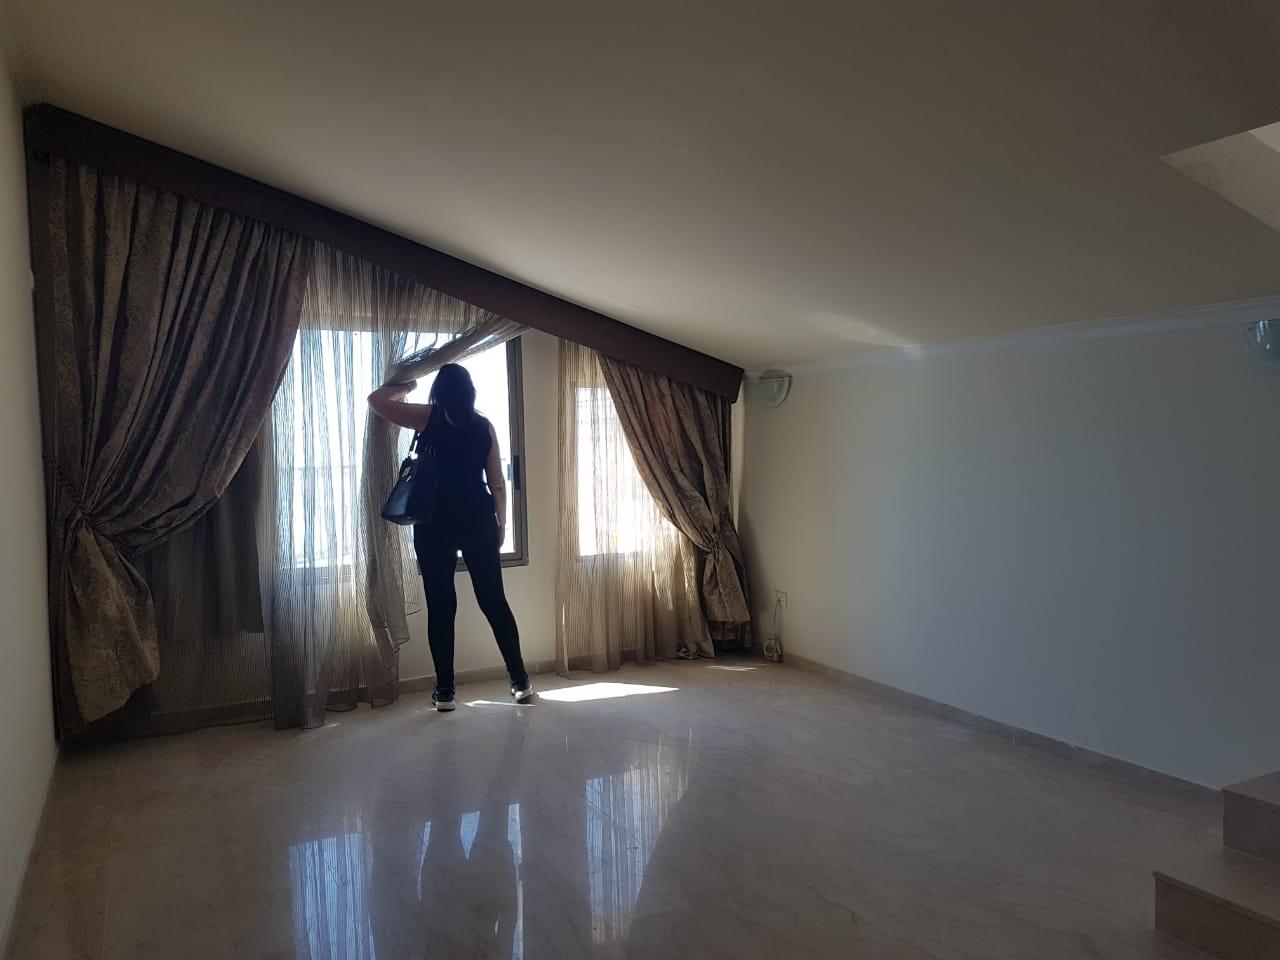 A beautiful villa for sale in harissa, Keserwan Lebanon, real estate in jounieh Lebanon, buy sell properties in jounieh harissa lebanon